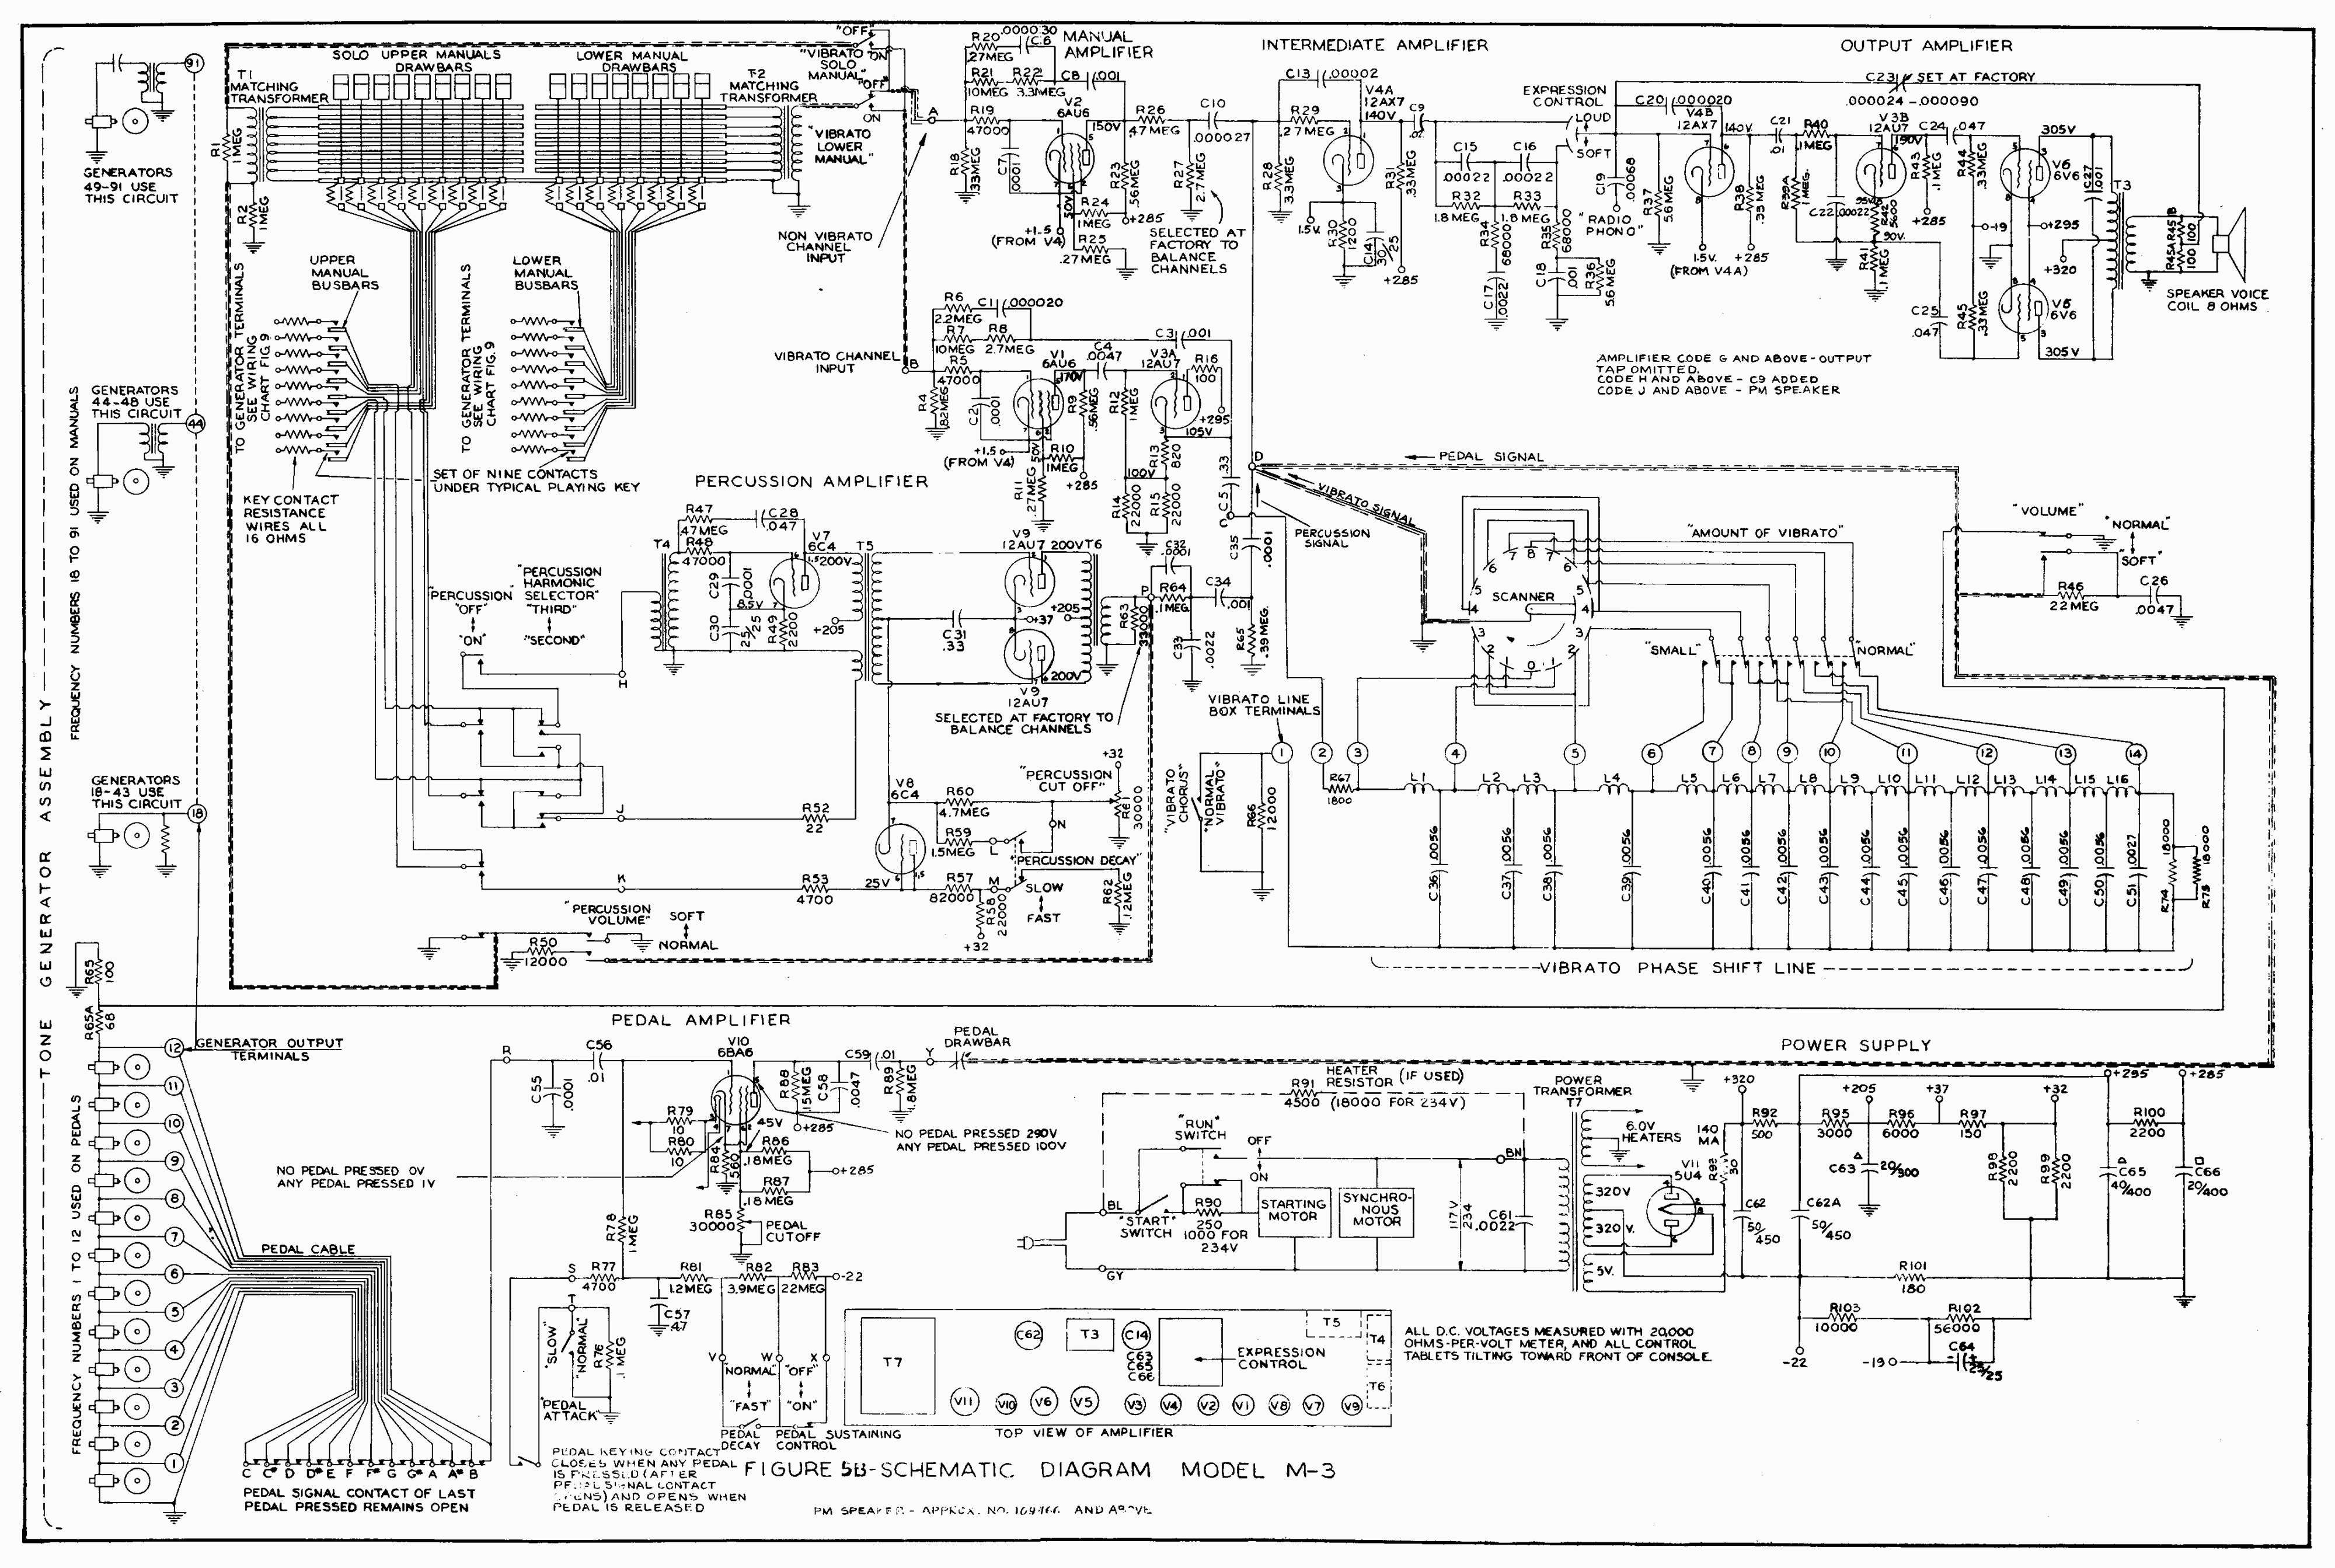 Wiring Diagram Electrical. Wiring Diagram Electrical. | Diagram ... 480 to 240 3 phase transformer wiring Pinterest